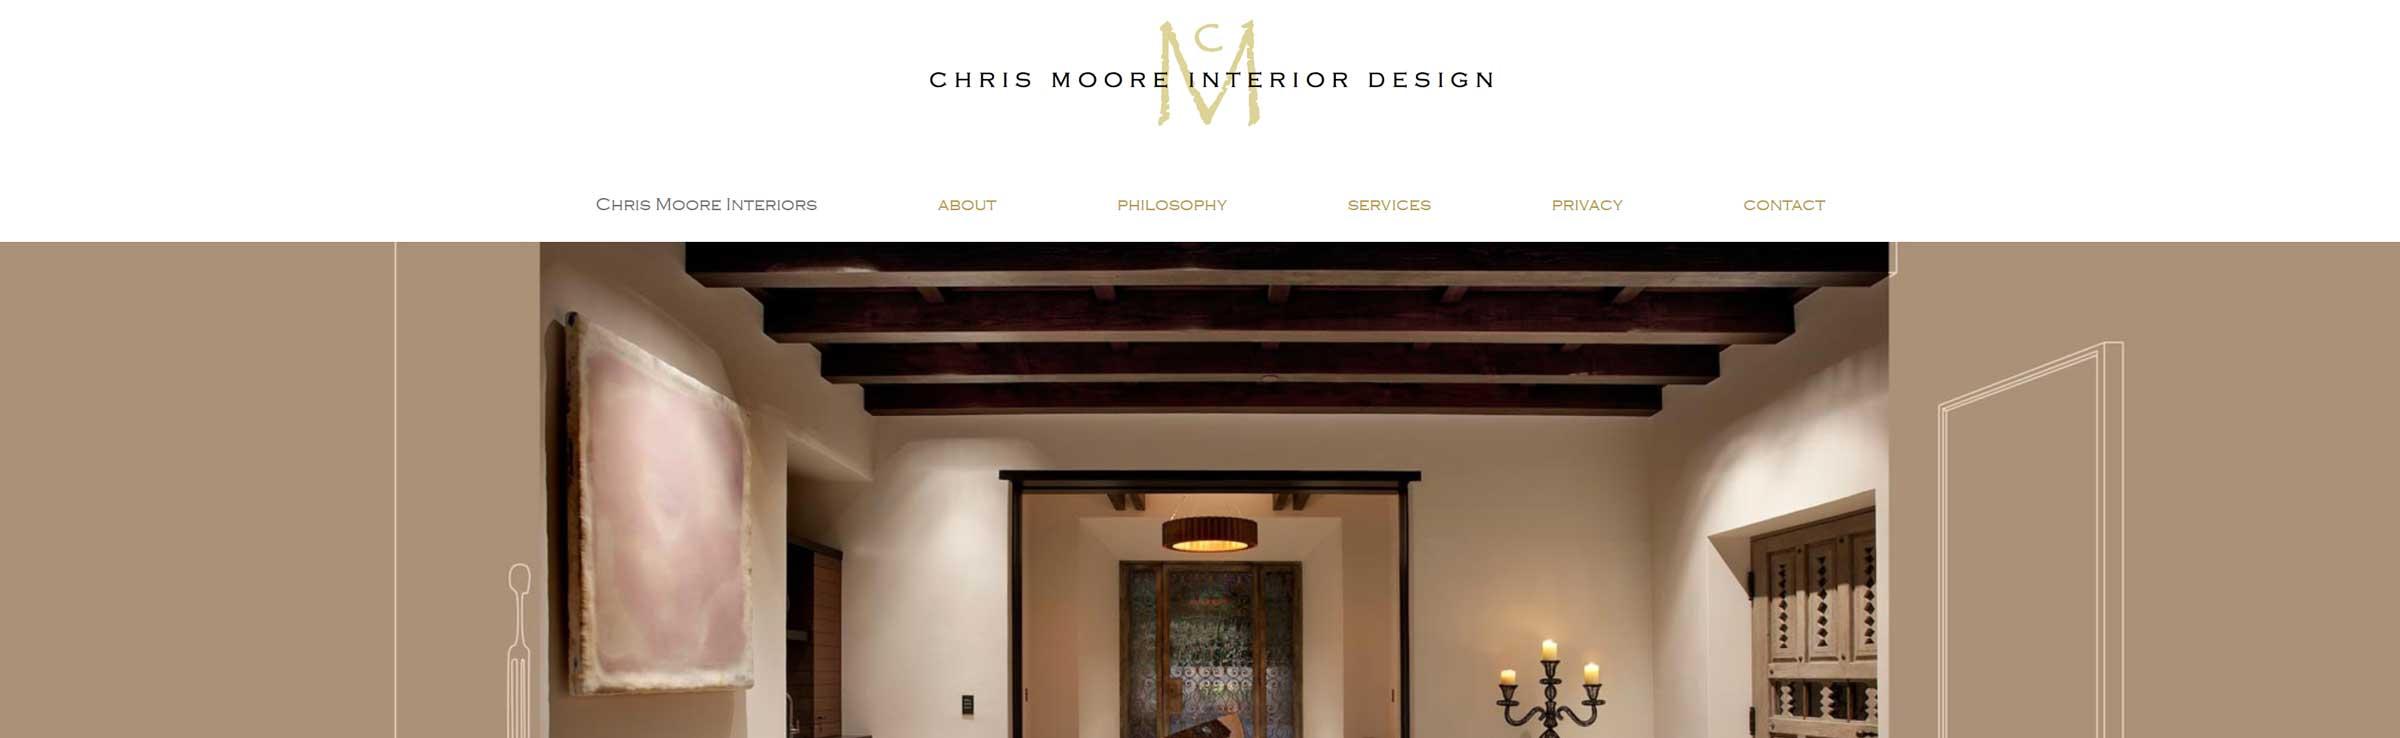 Chris Moore Interiors banner